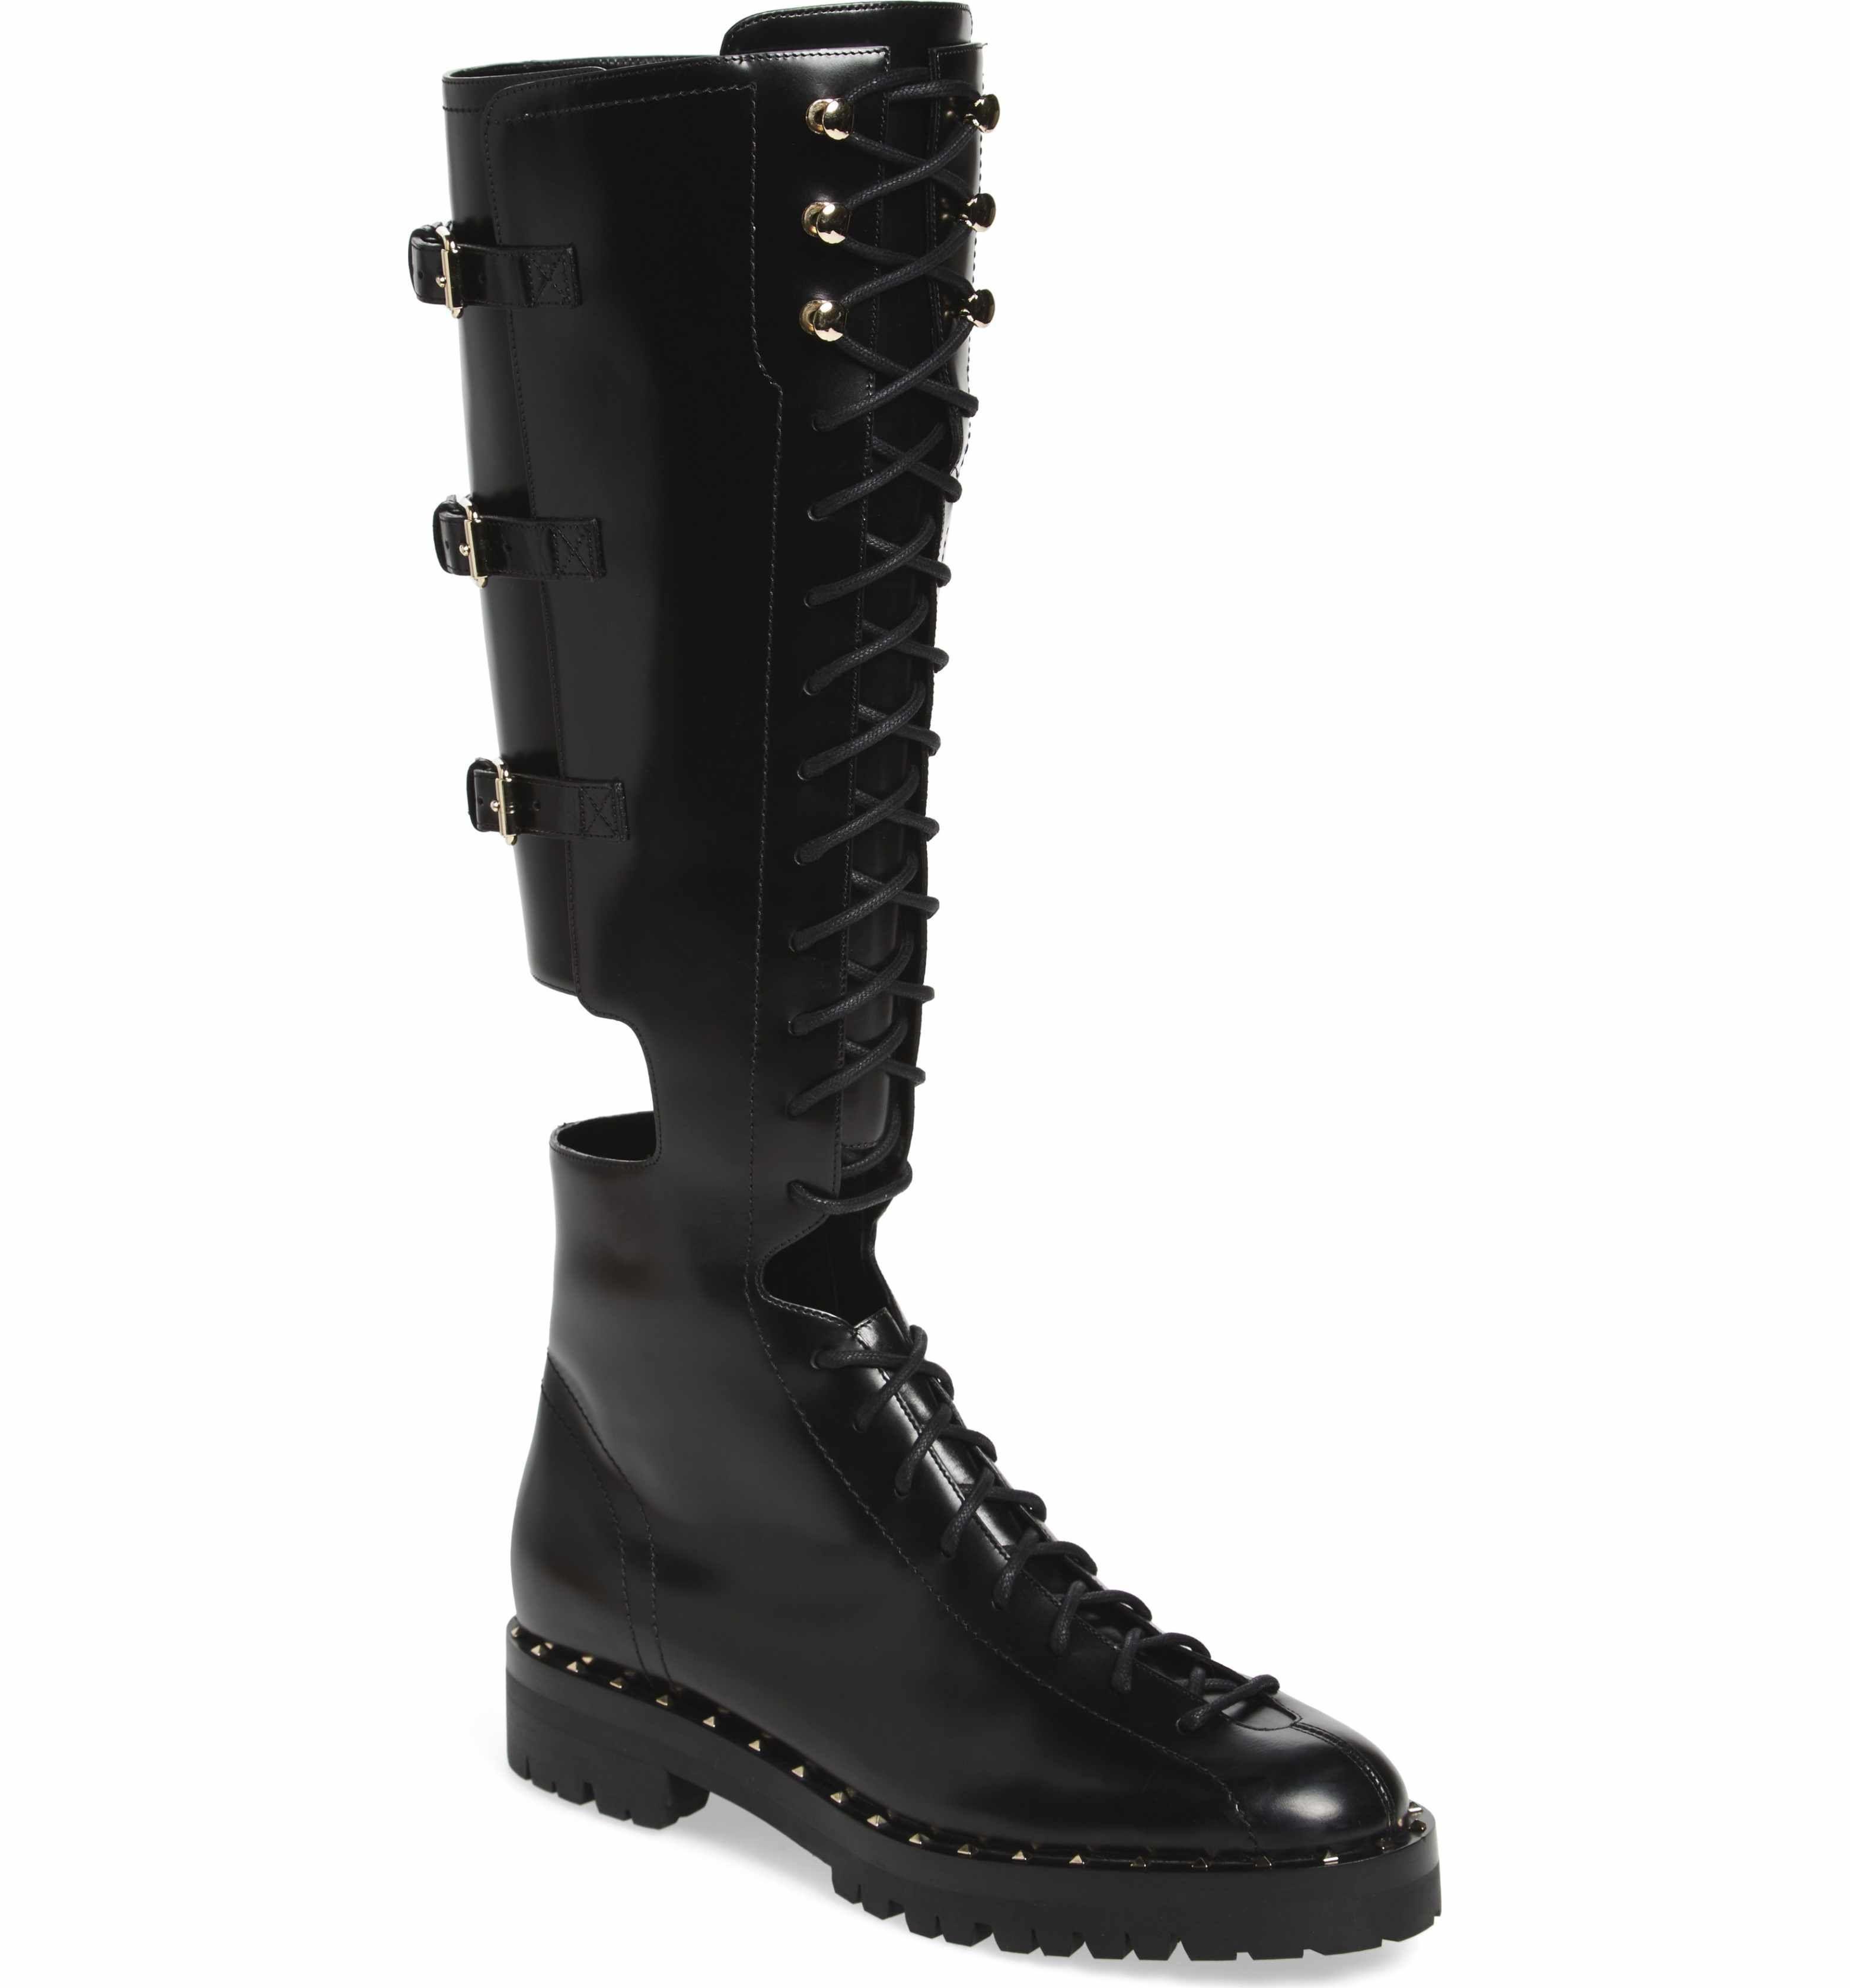 bed09ecb95a Main Image - VALENTINO GARAVANI Soul Rockstud Knee High Cutout Boot (Women)